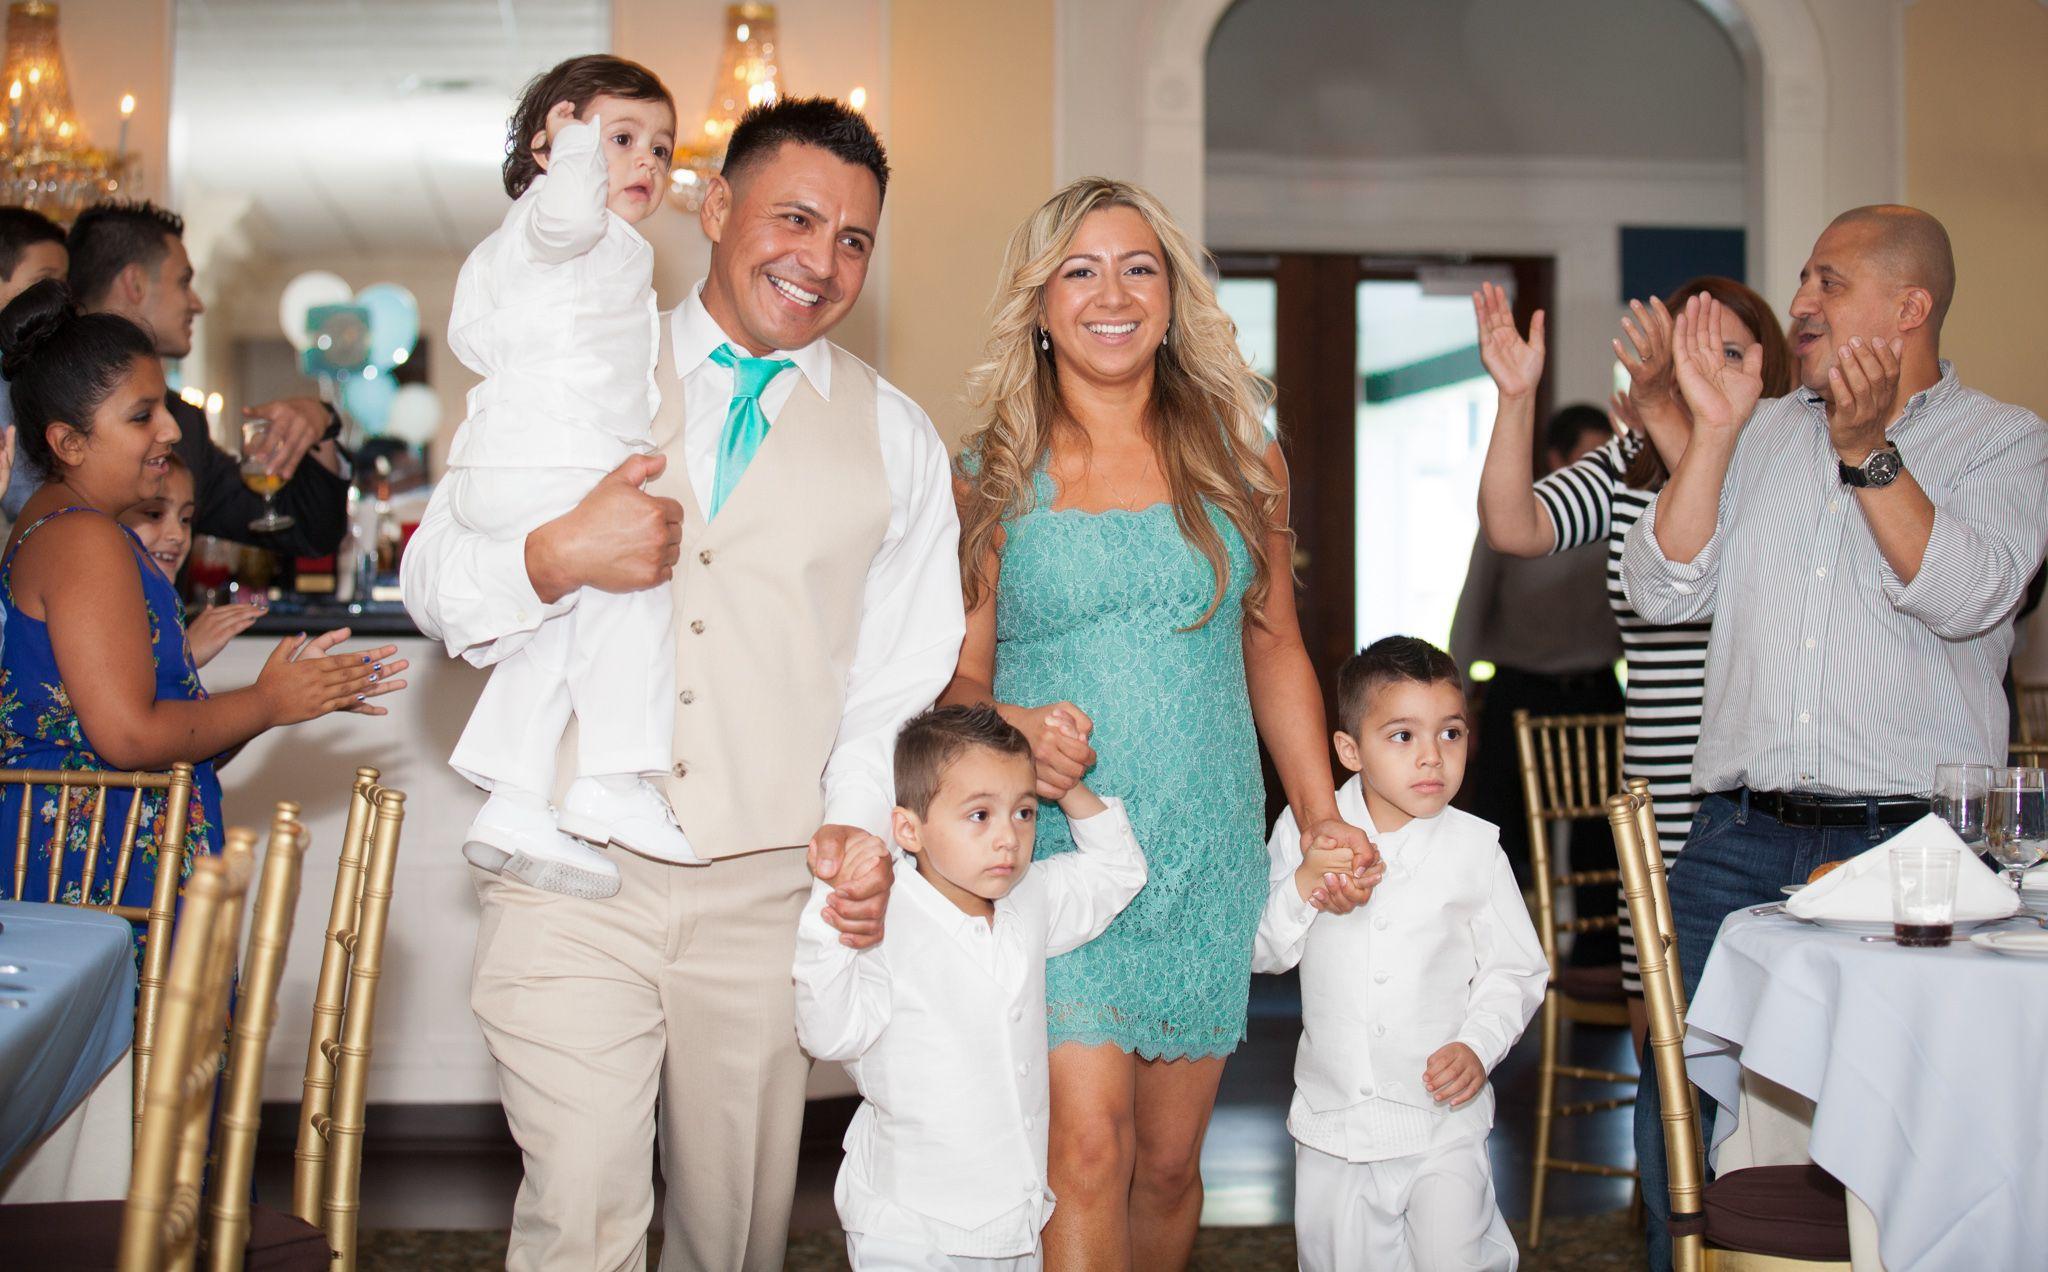 #wedding #entrance #boxofdreamsphotography #kids #weddingparty #nycweddings #longislandweddings #reception #love #fun